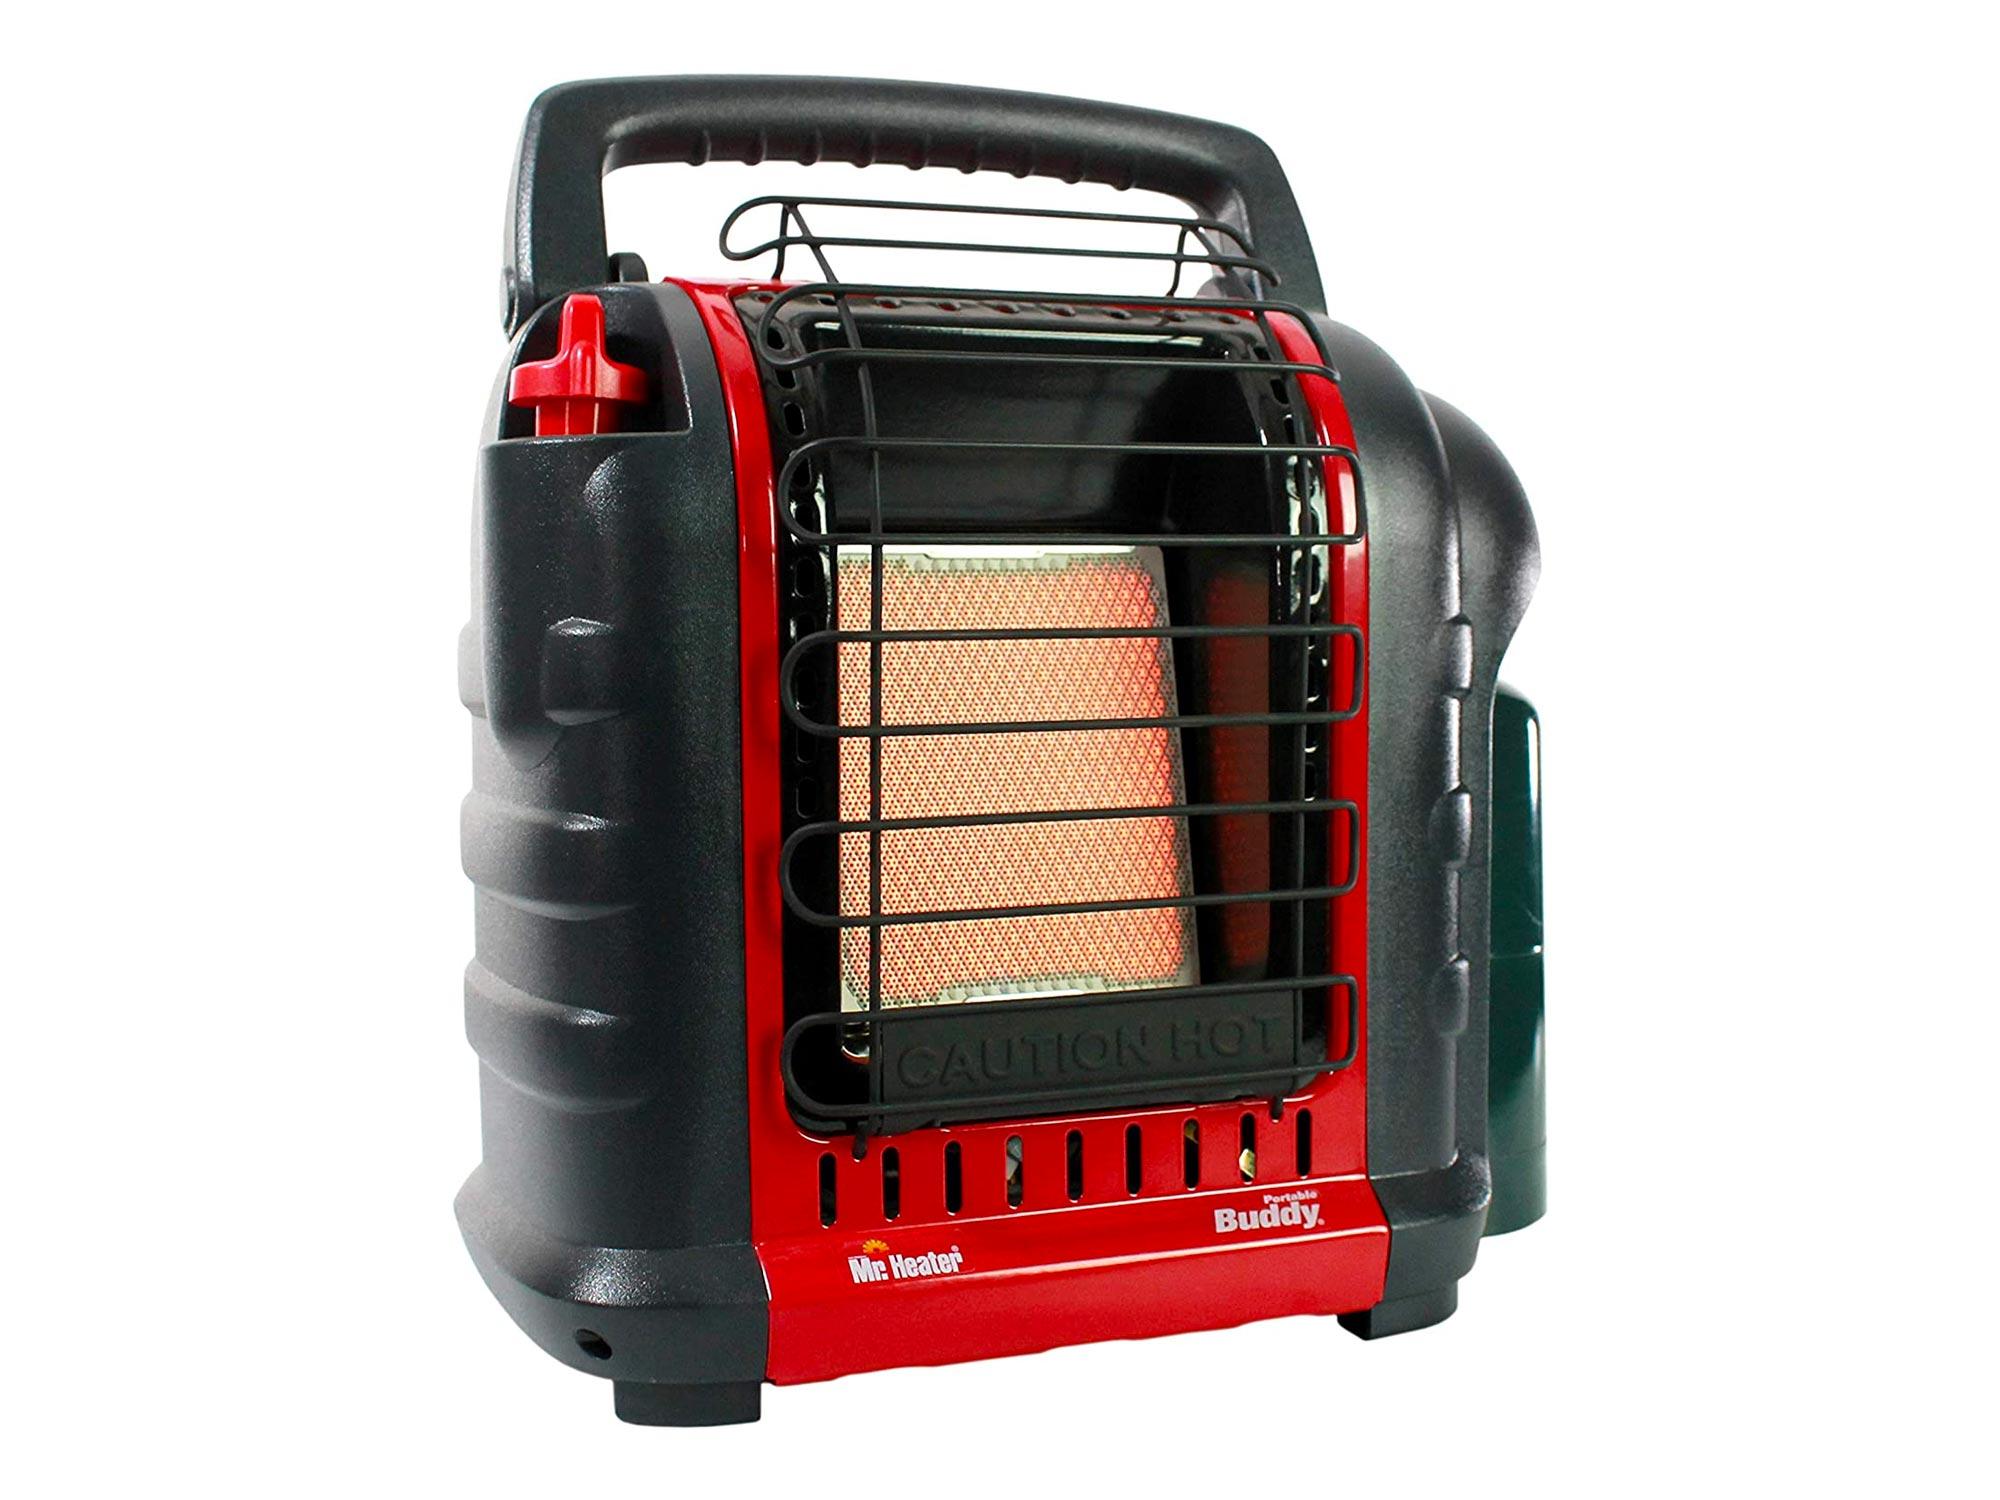 Mr. Heater Buddy 4,000-9,000-BTU Indoor-Safe Portable Propane Radiant Heater, Red-Black